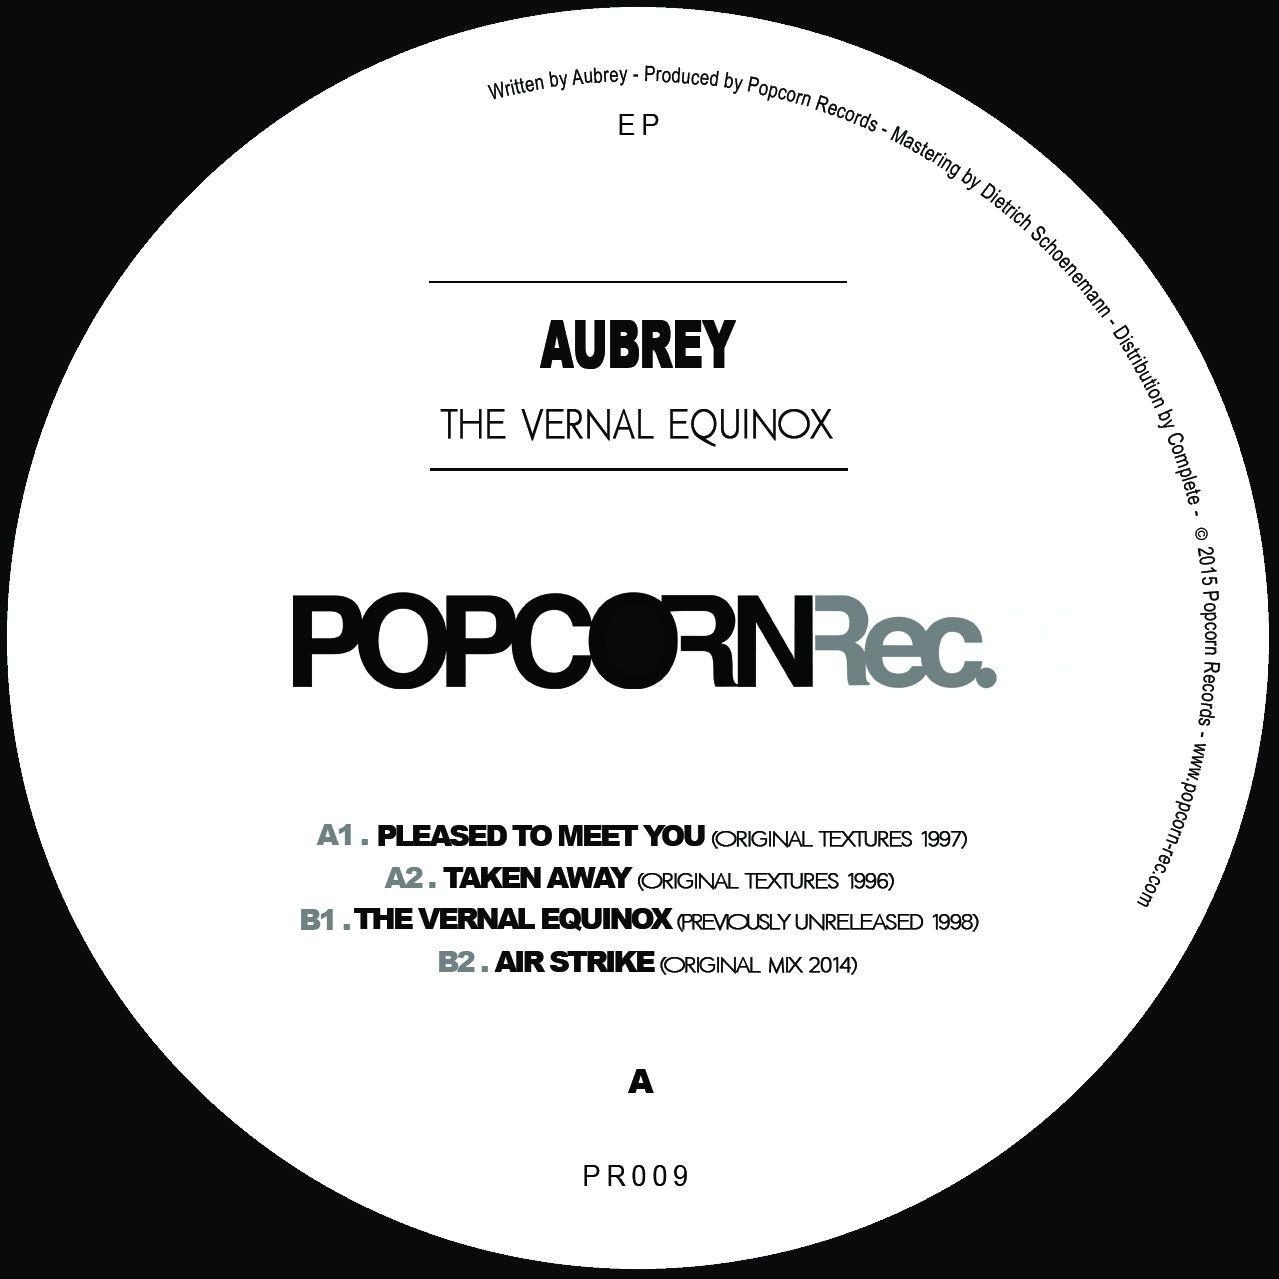 Aubrey - The Vernal Equinox [Repress]